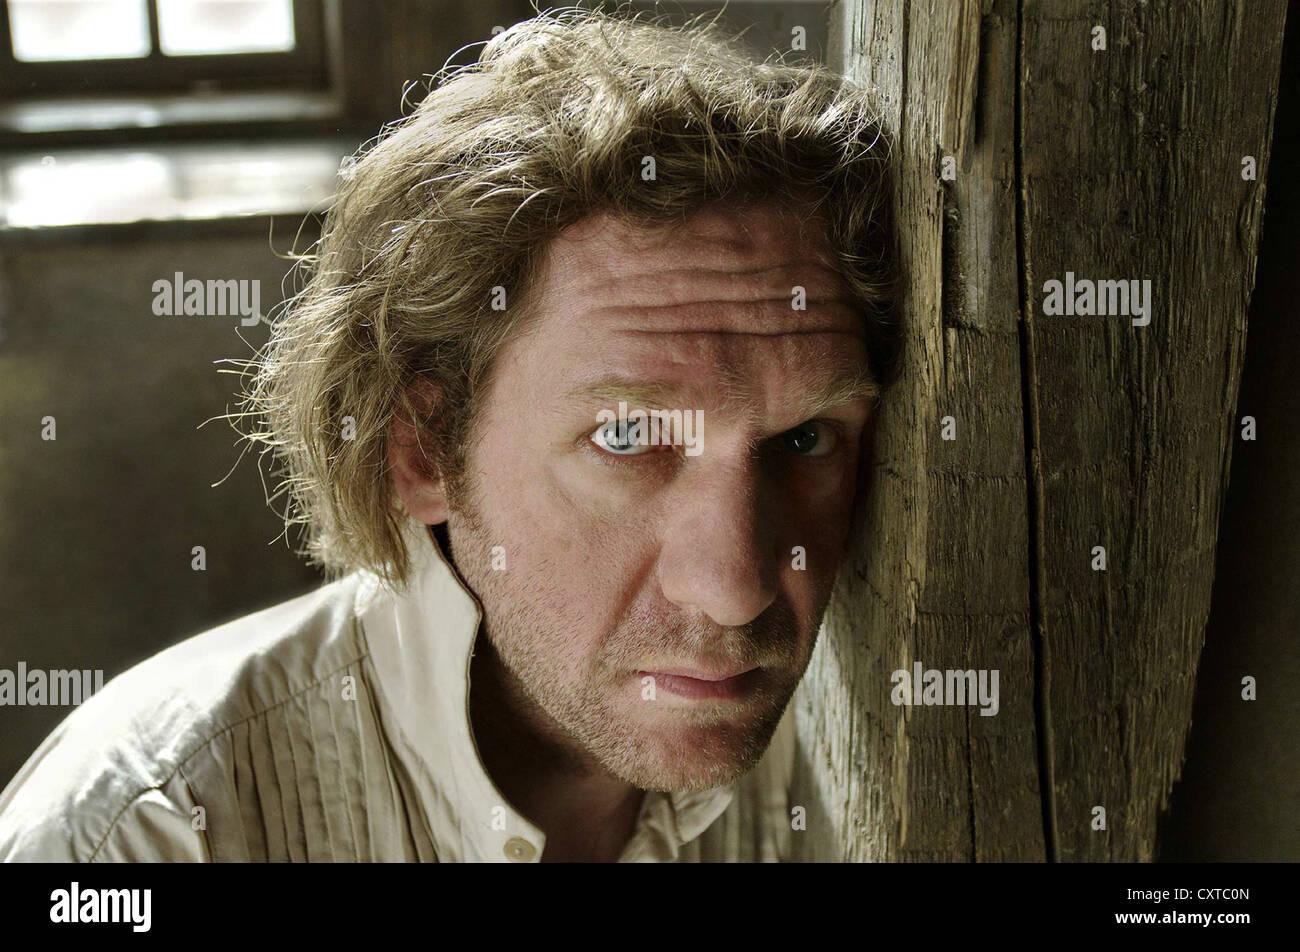 FAUST (2011) JOHANNES ZEILER, ALEKSANDR SOKUROV (DIR) 006 MOVIESTORE COLLECTION LTD - Stock Image